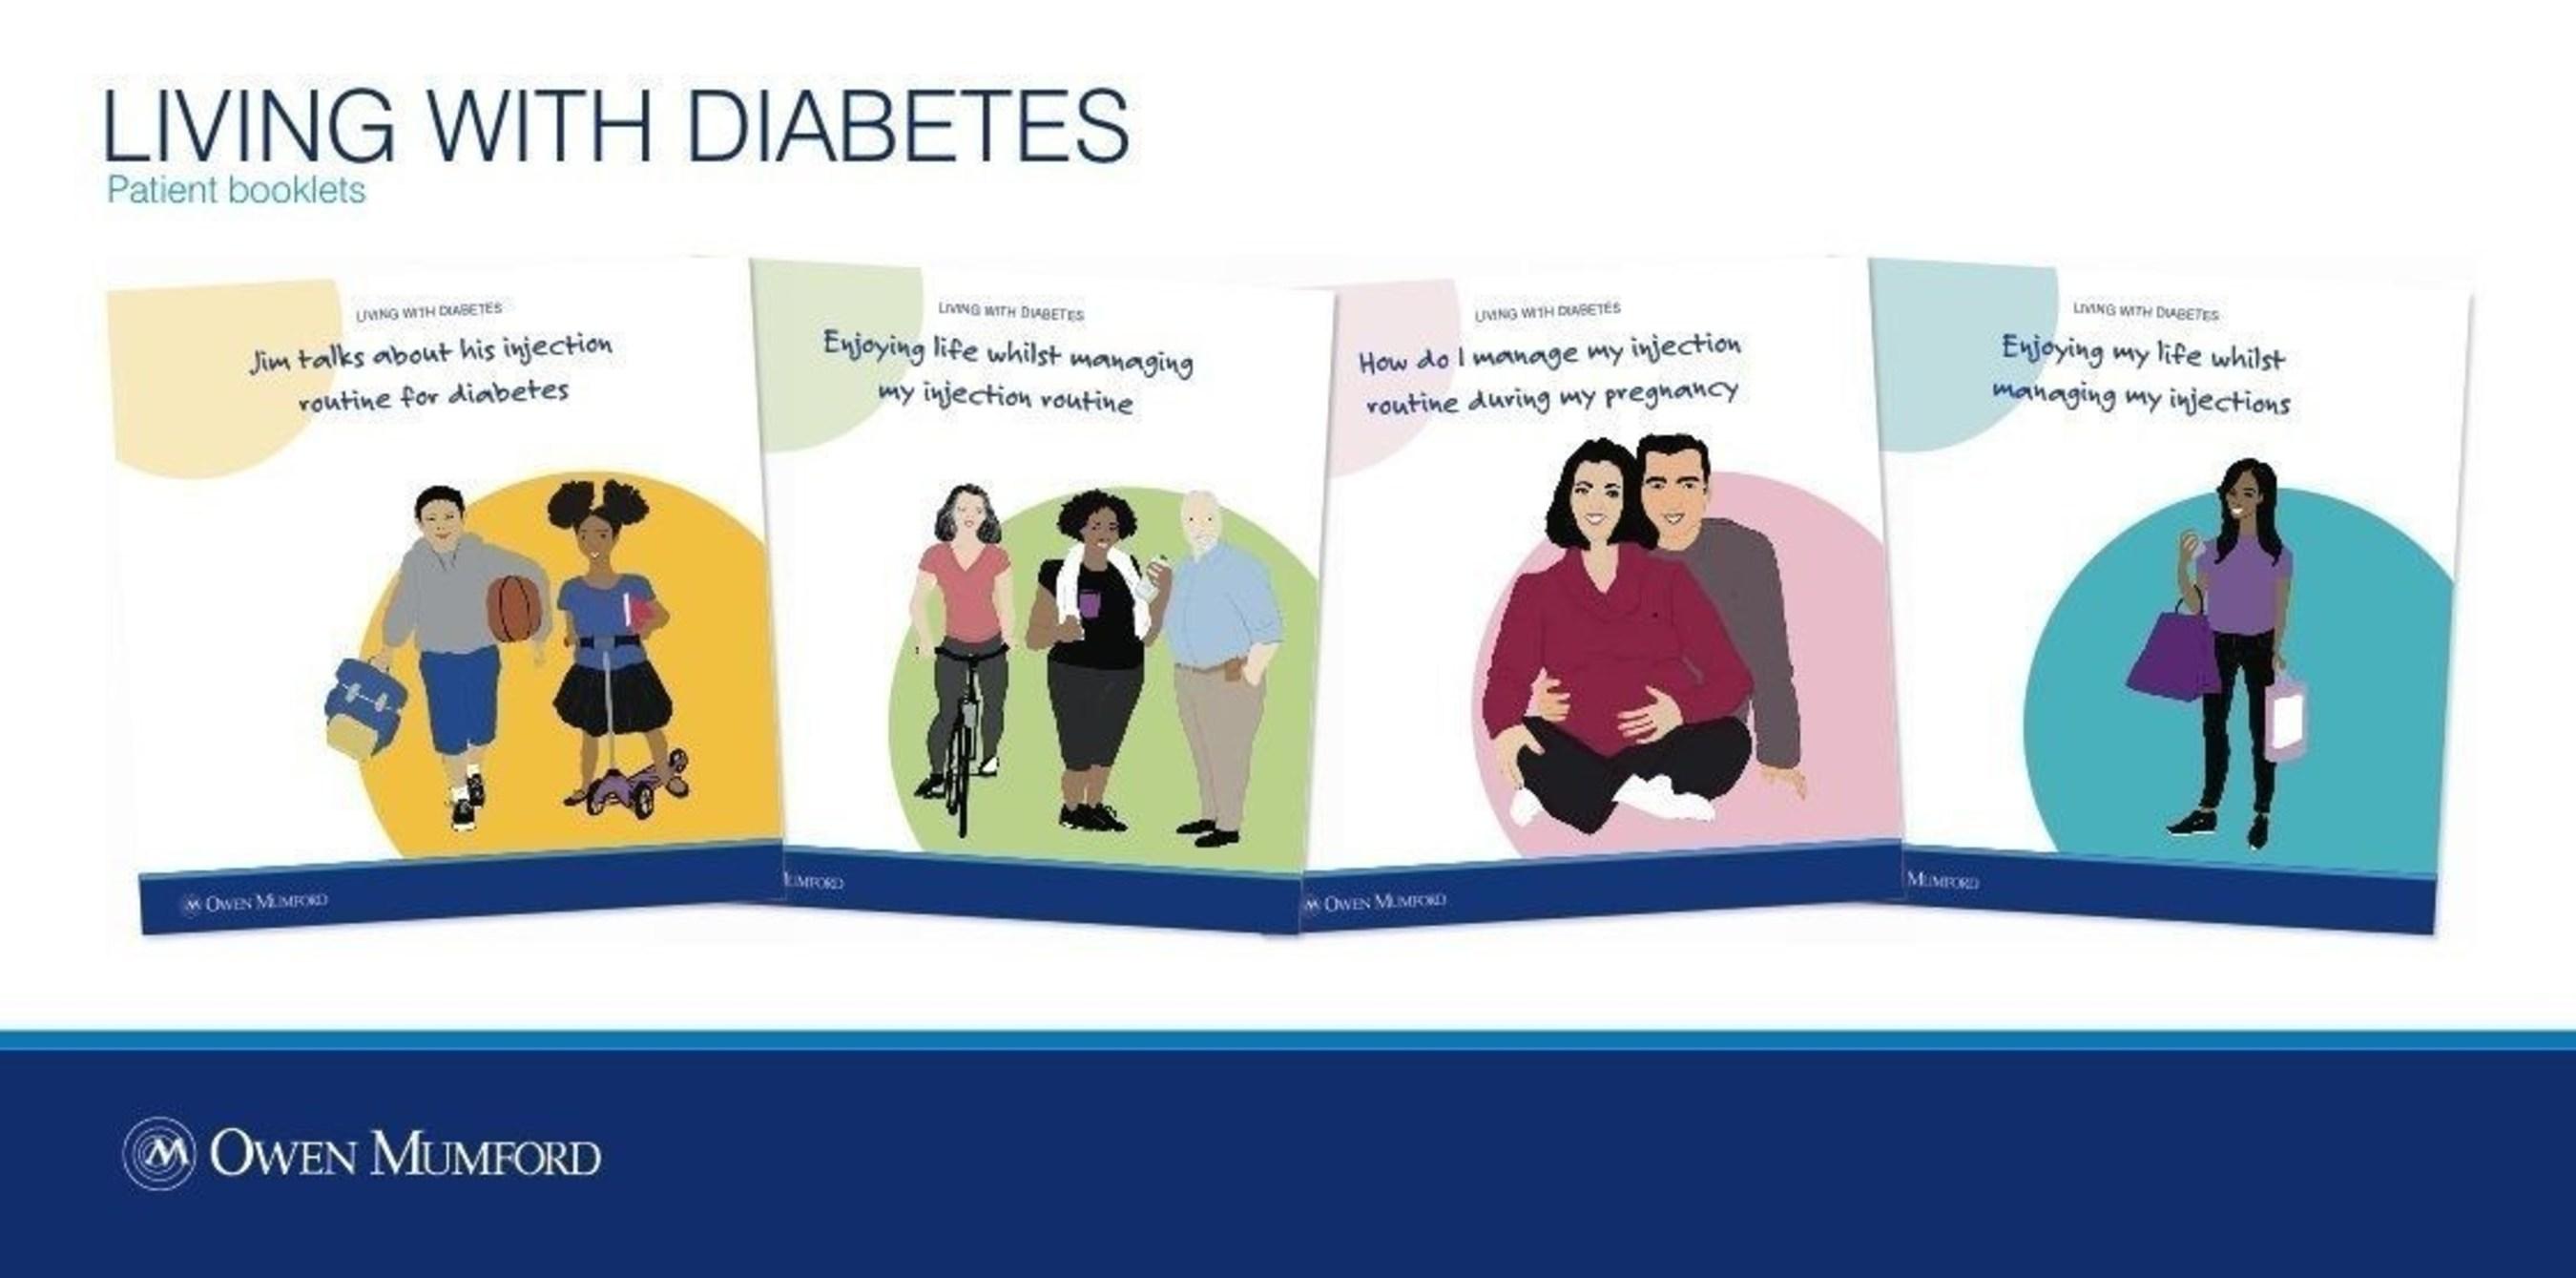 Owen Mumford's Diabetes Educational Materials (PRNewsFoto/Owen Mumford)